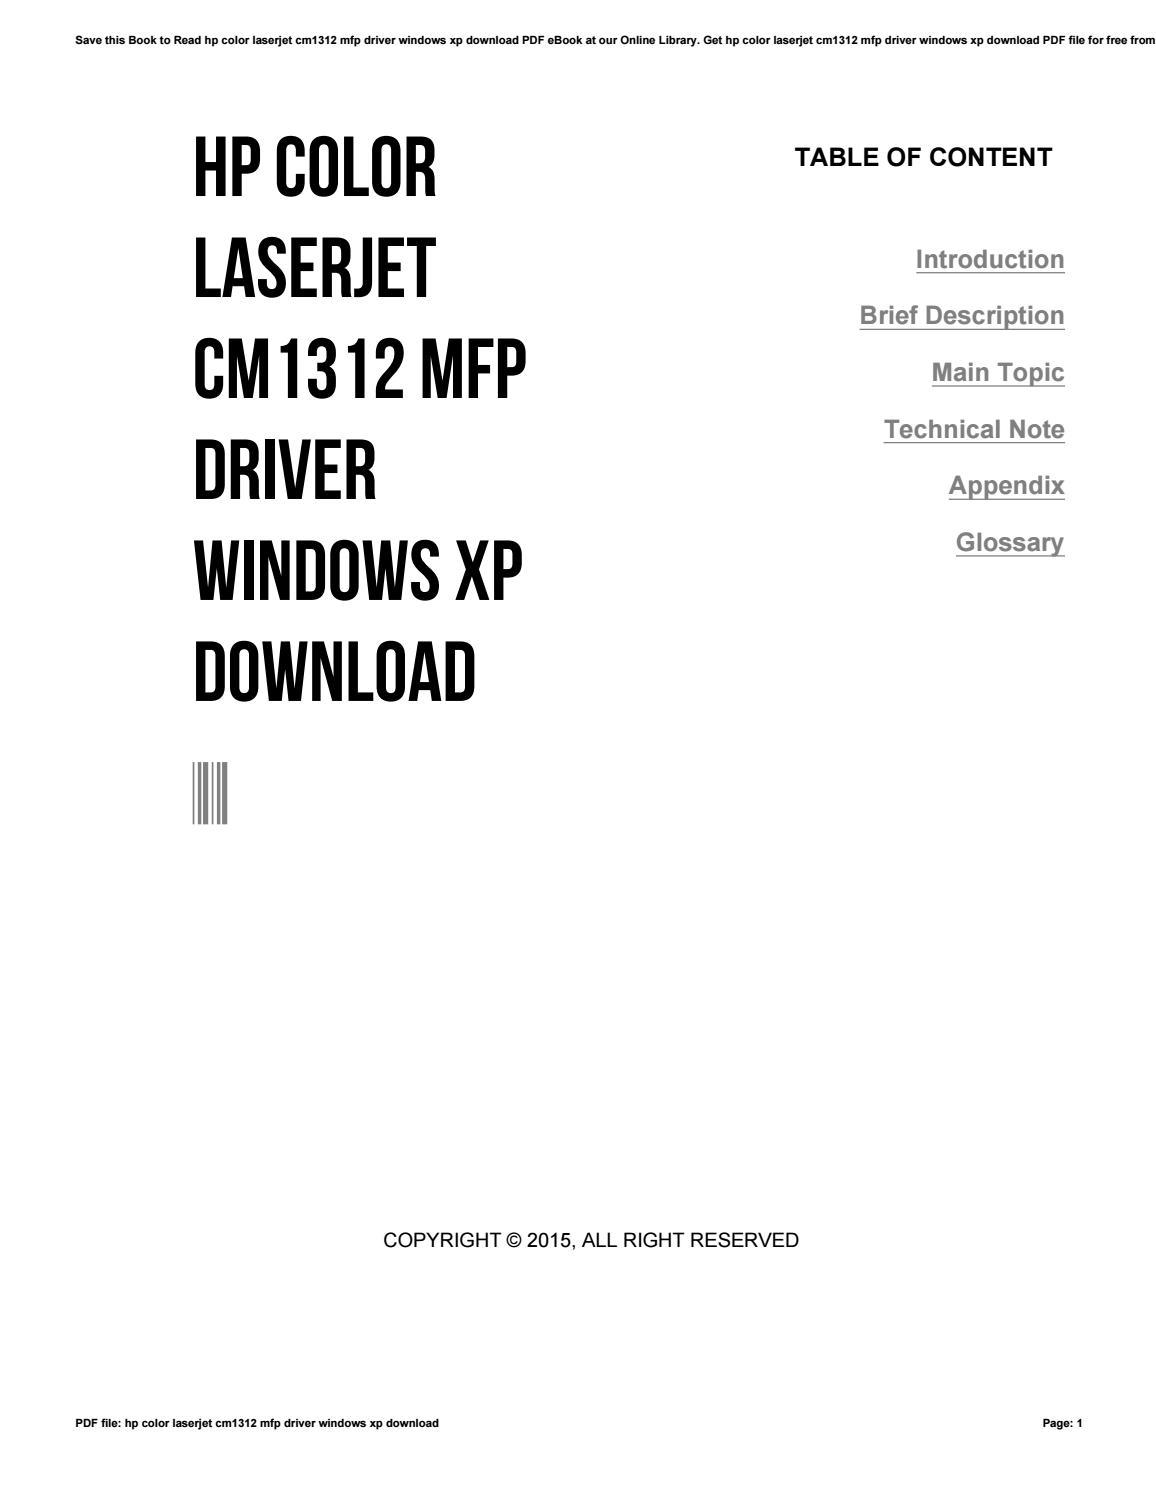 Hp color laserjet cm1312 mfp driver windows xp download by